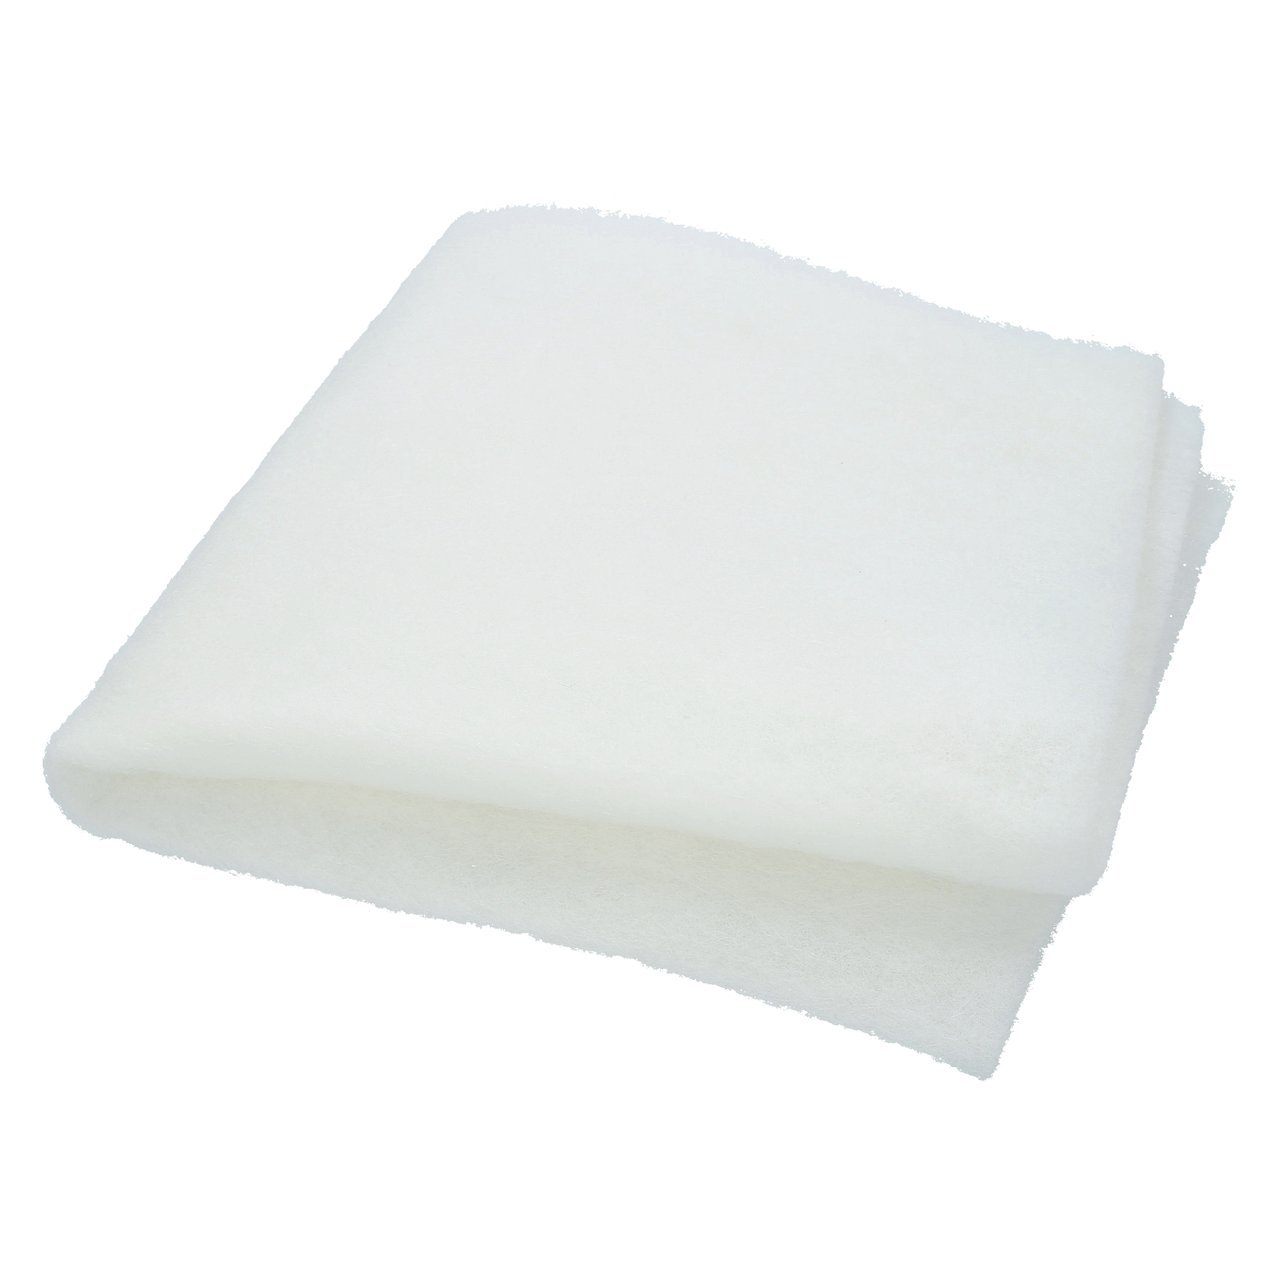 Filter Filtermatte, fett ✧WESSPER® Filter für Dunstabzugshaube Teka DY90